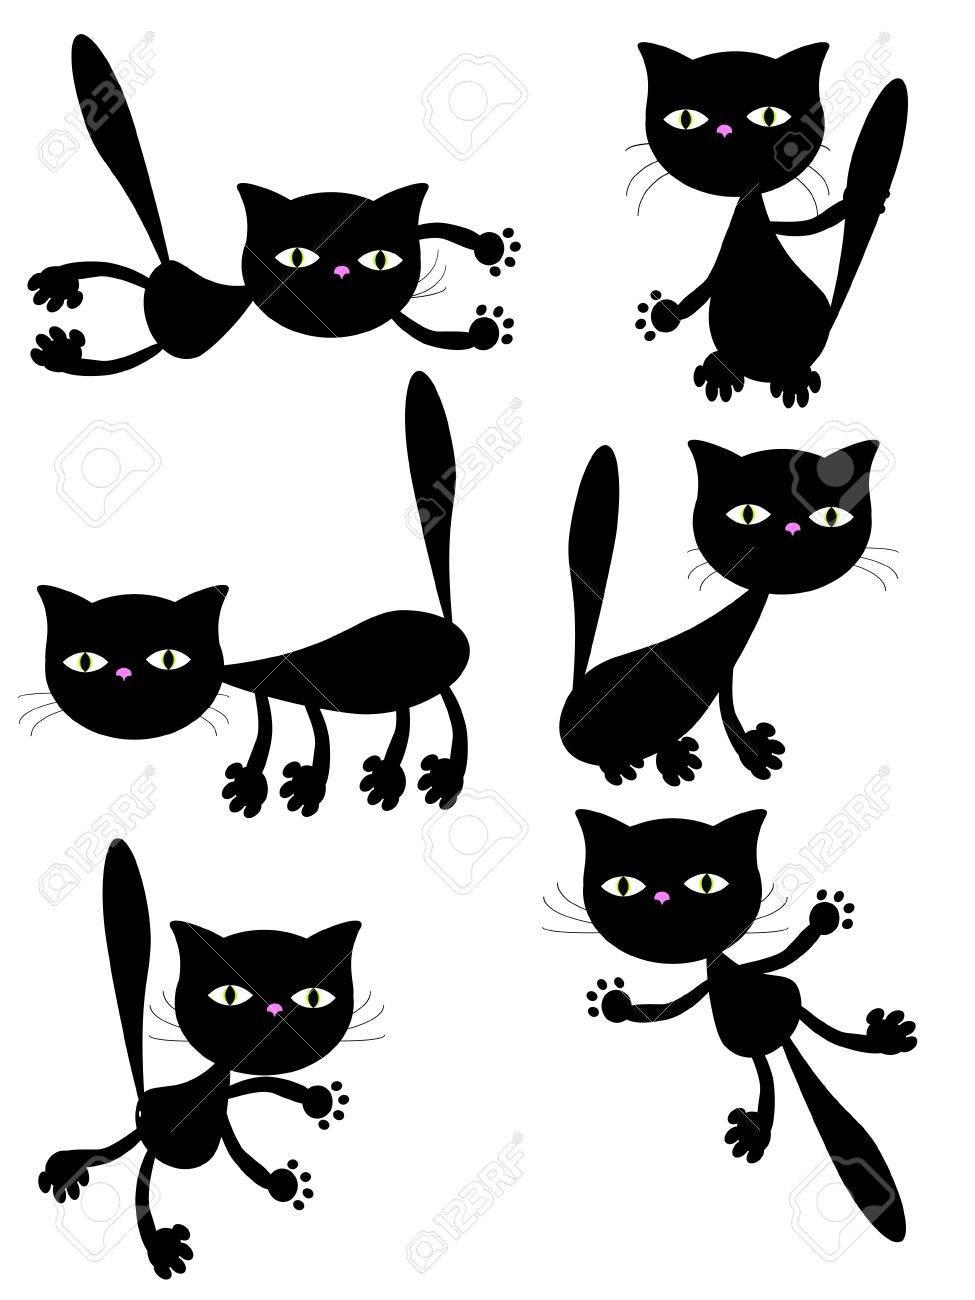 black cats. Stock Vector - 10115597